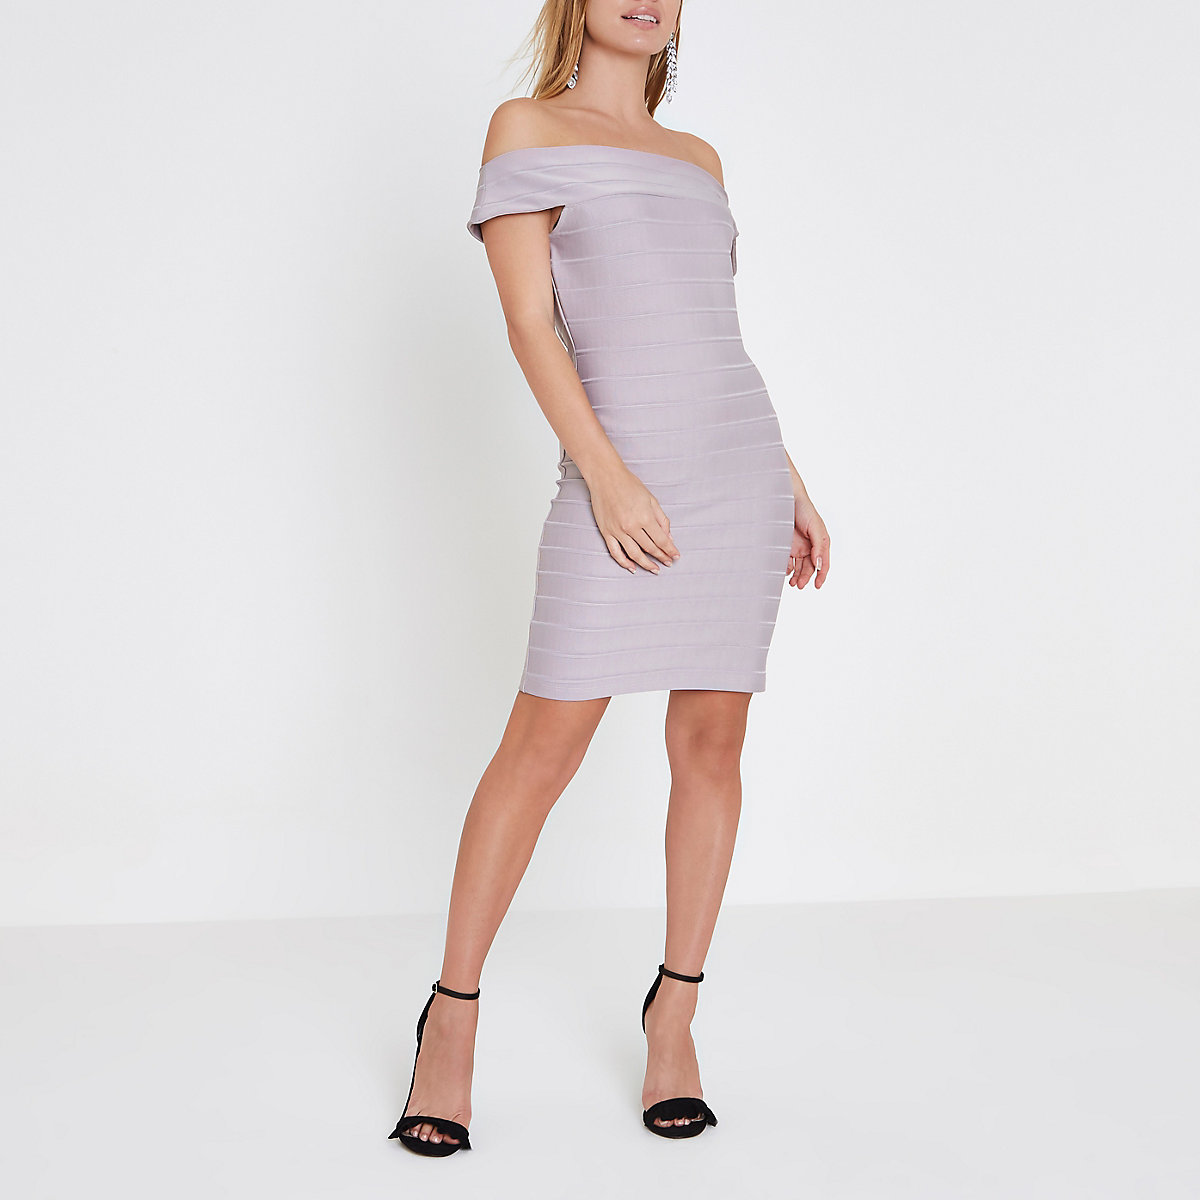 Dresses Bodycon Dresses bodycon grey Petite dress bandage bardot qw0FXxP6